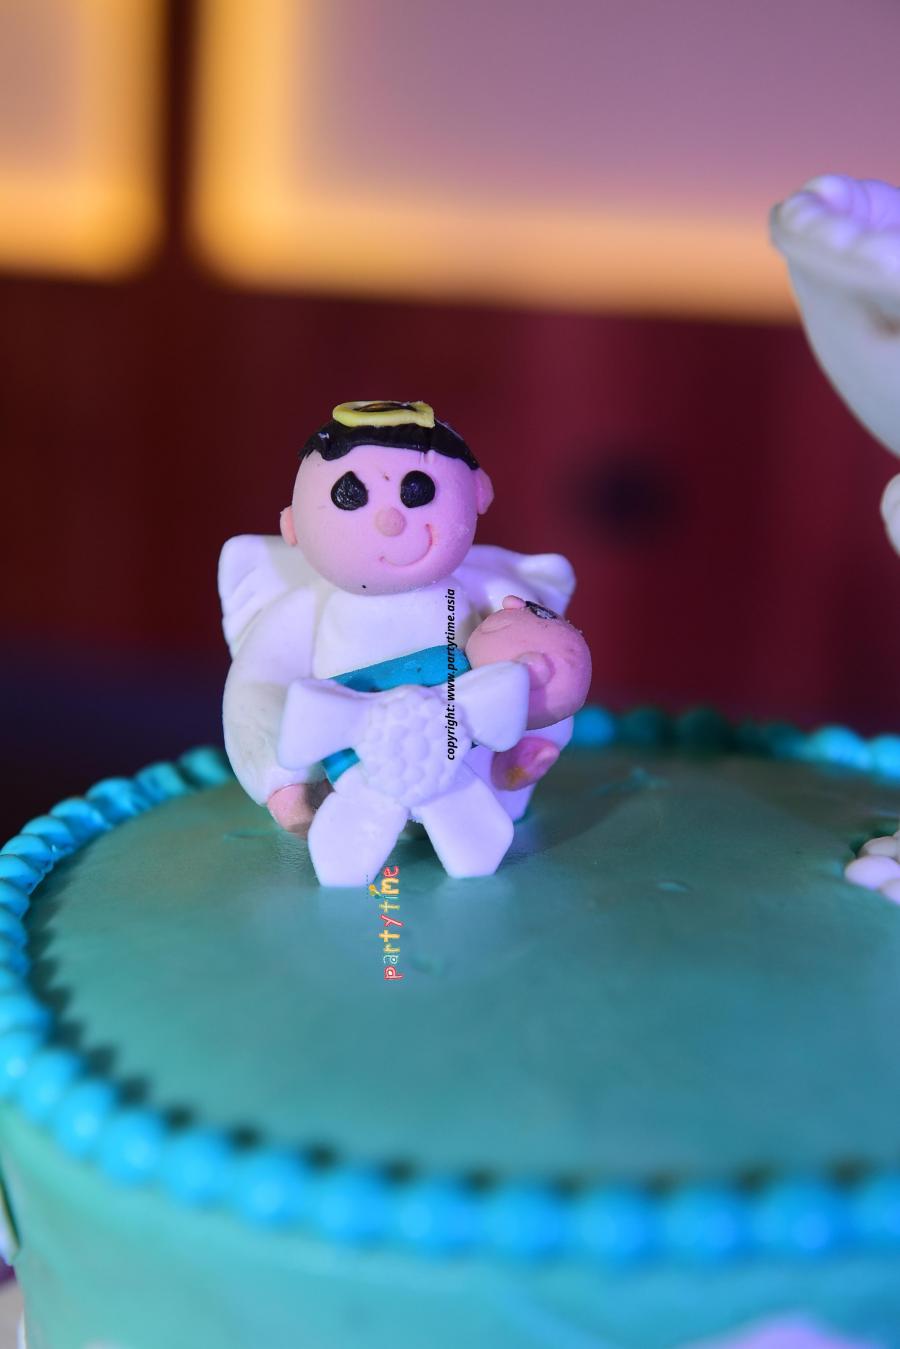 Baptism Theme Cake and Decoration Kochi, Kerala - Partytime With Aladin